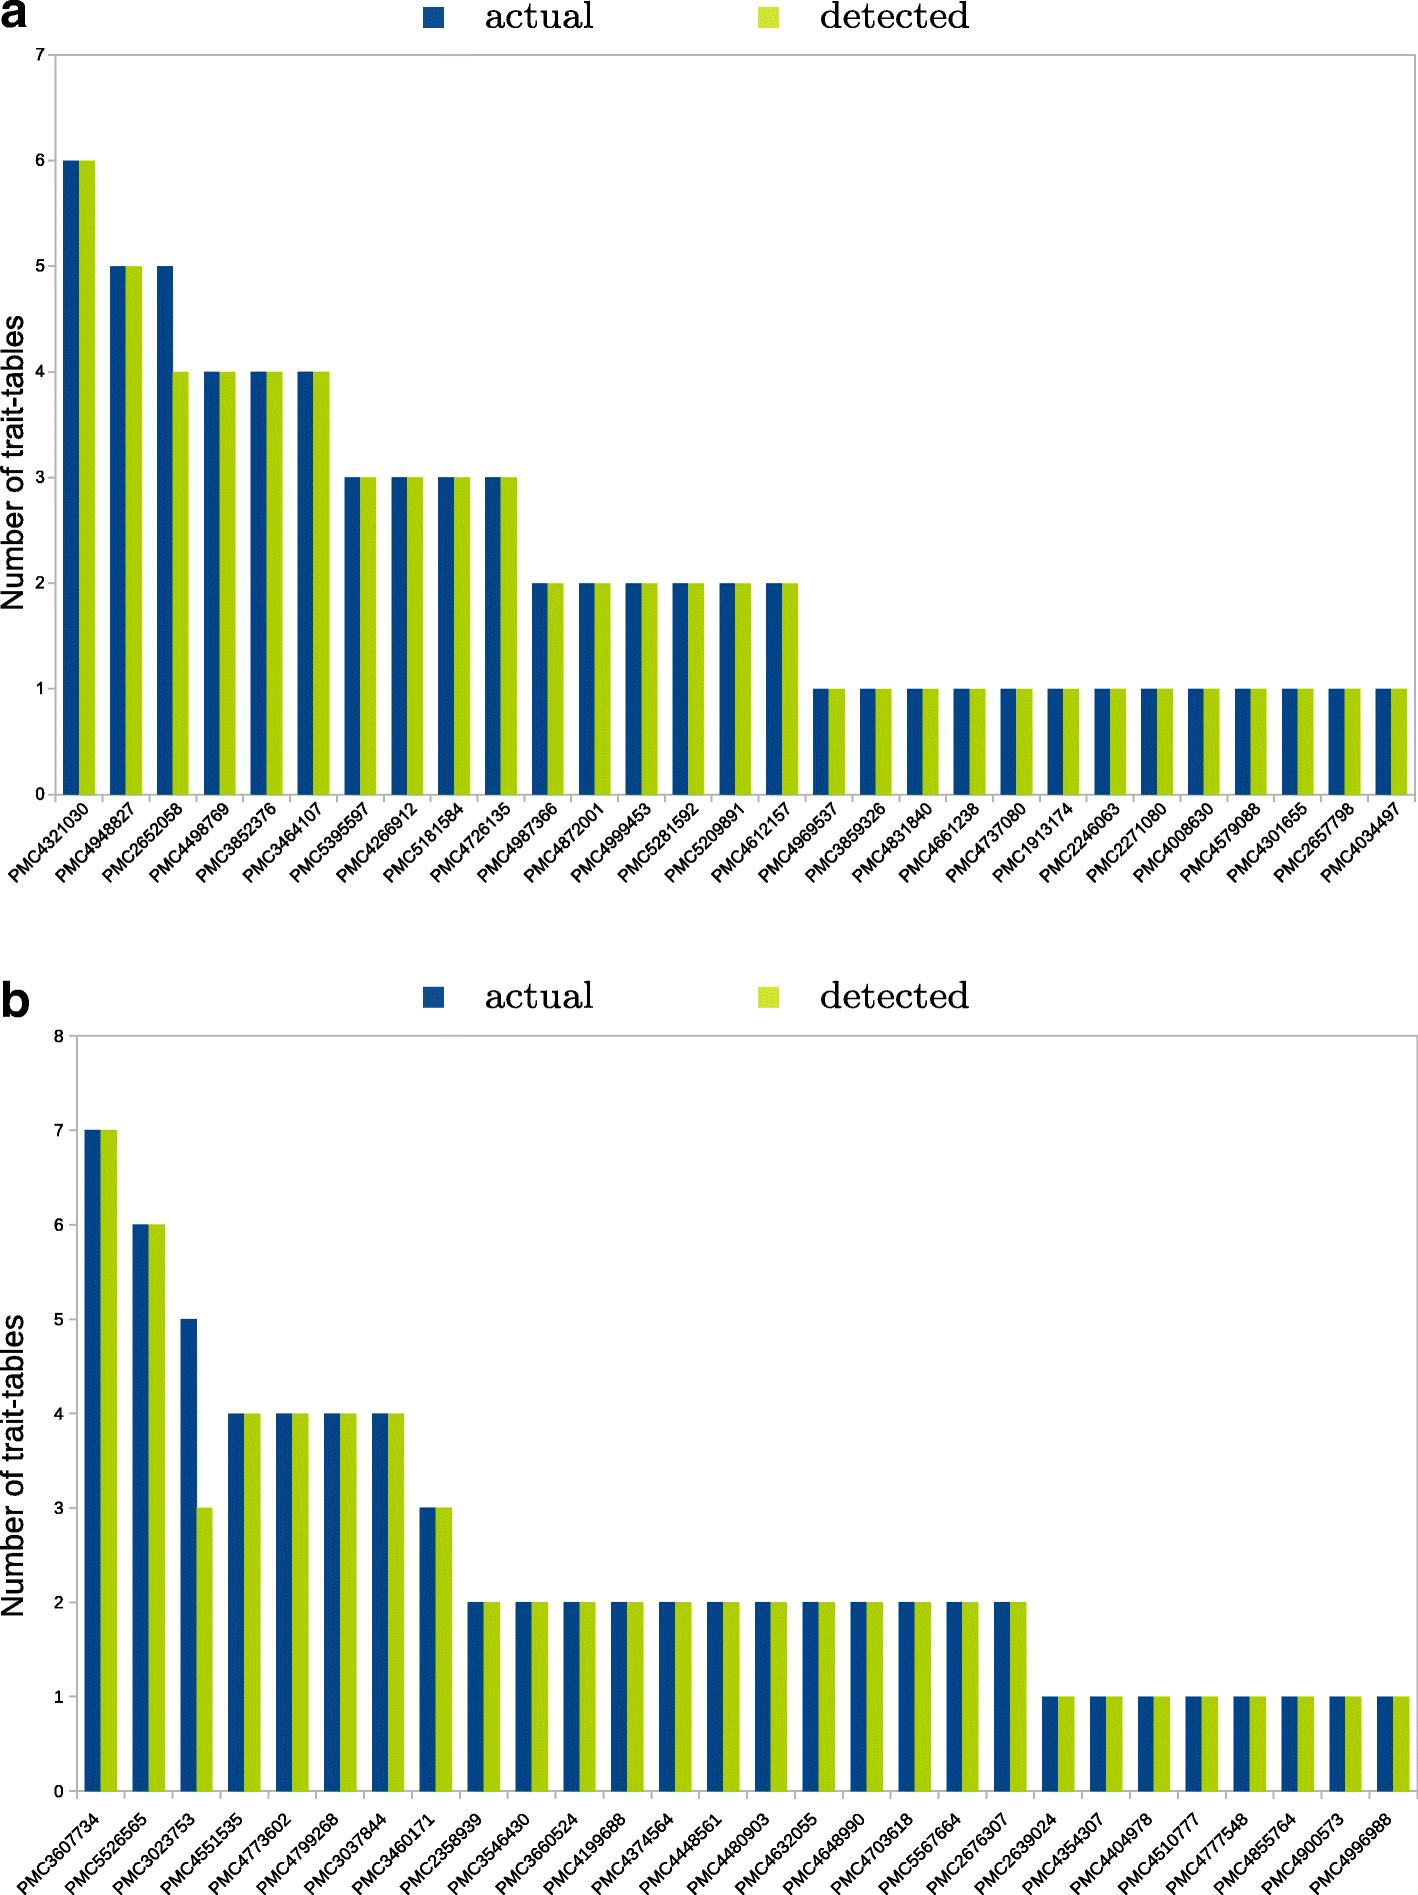 QTLTableMiner++: semantic mining of QTL tables in scientific